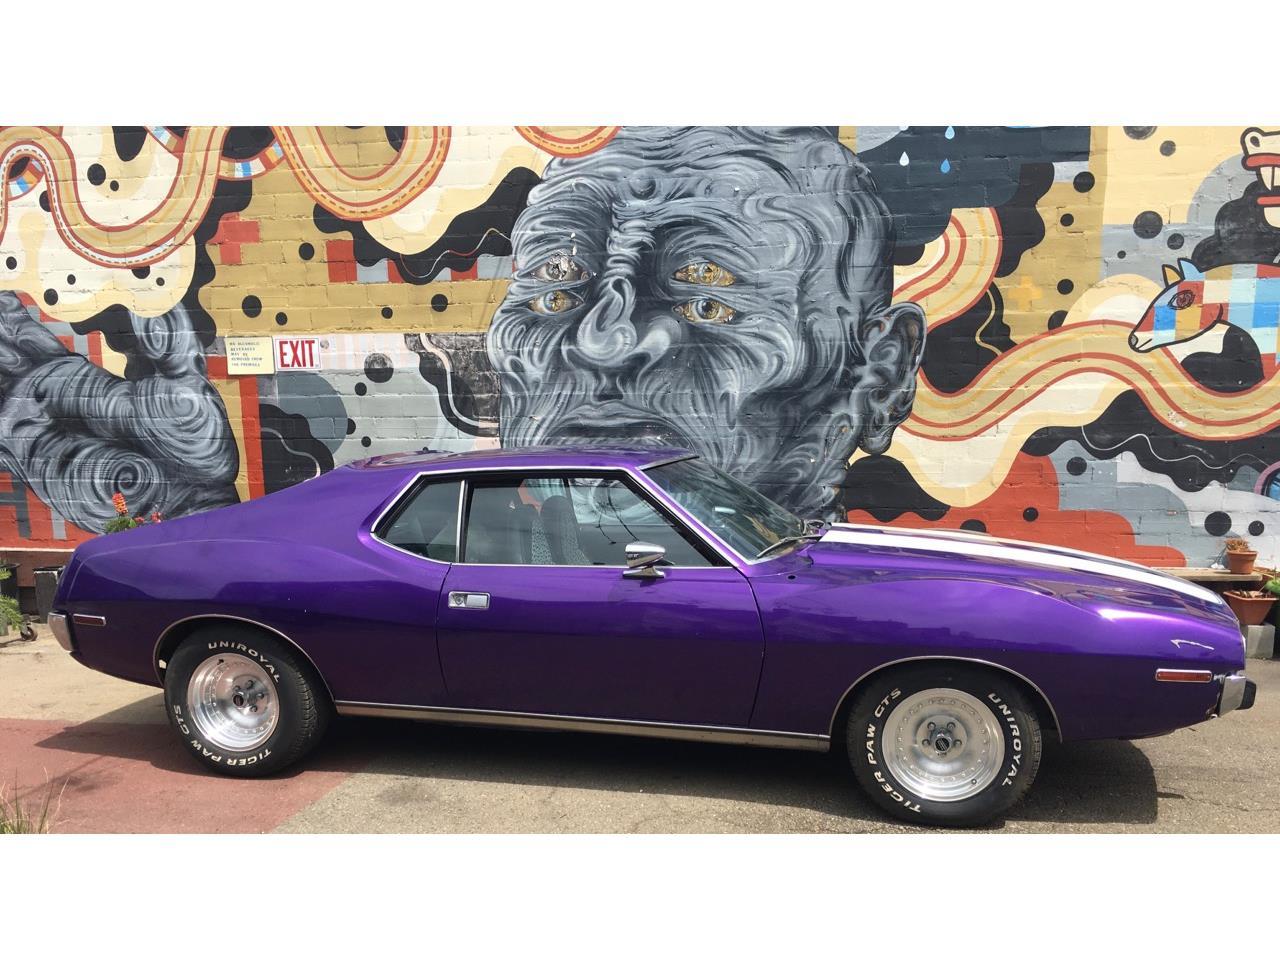 For Sale: 1973 AMC Javelin in Oakland, California